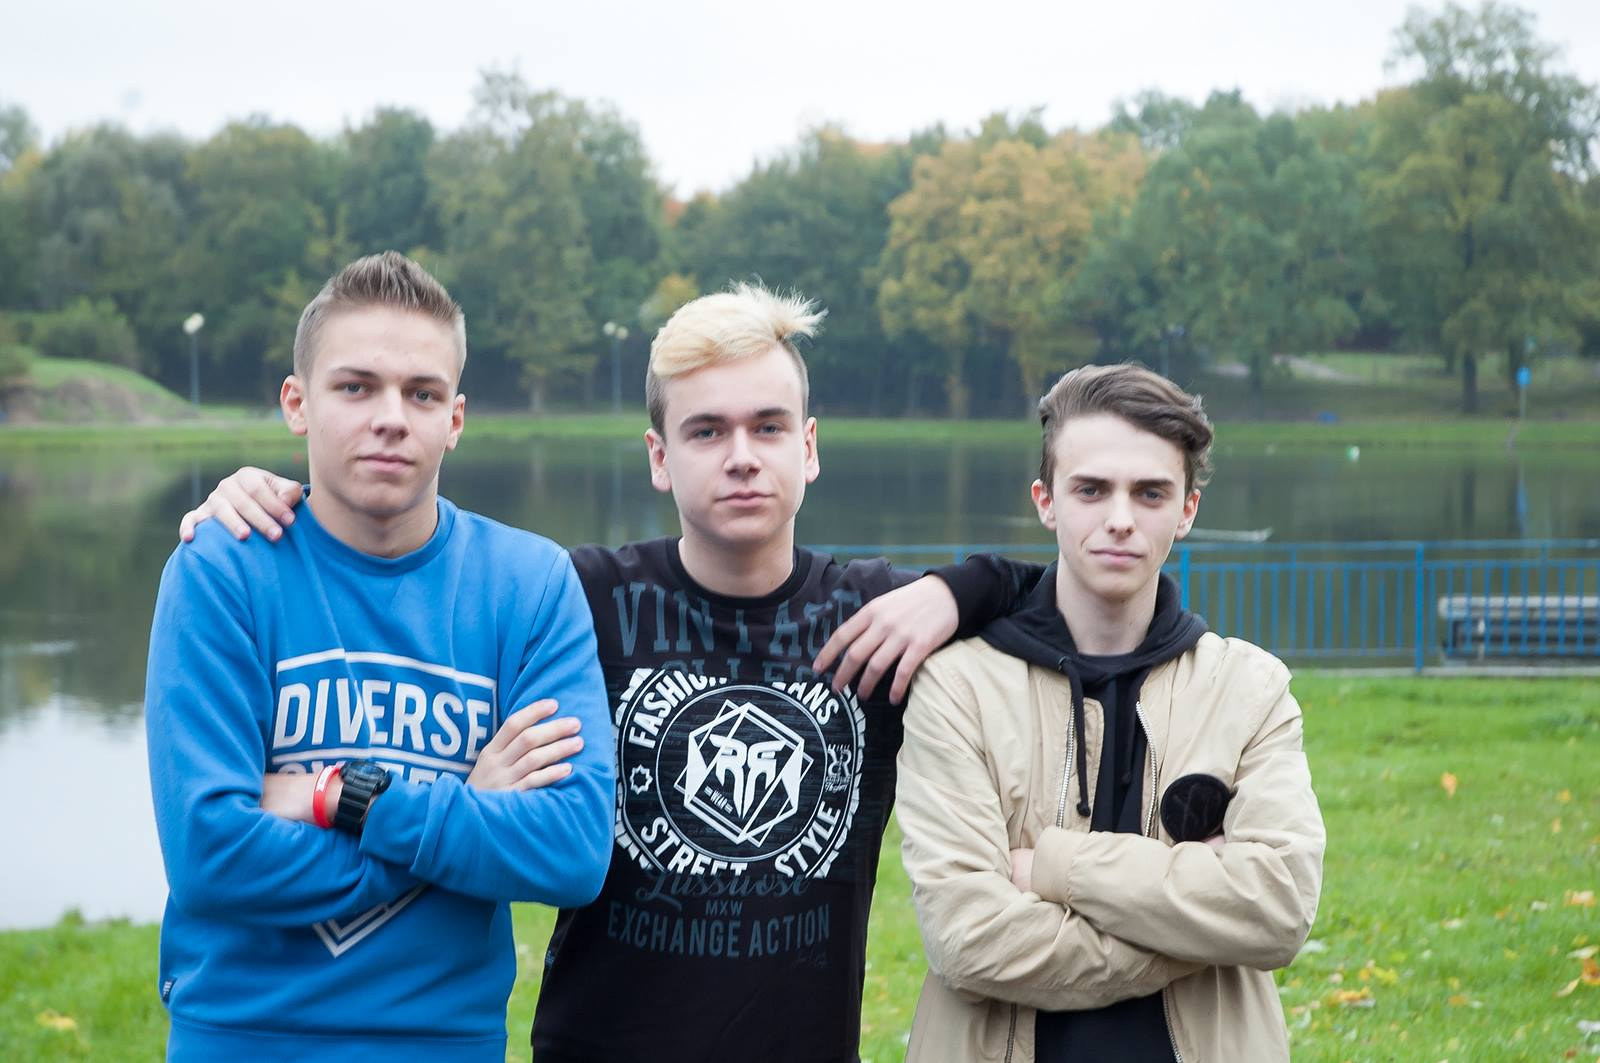 esport.kielce: Gradziu, Kr1s i Puchalax wygrali Mały LAN CS GO